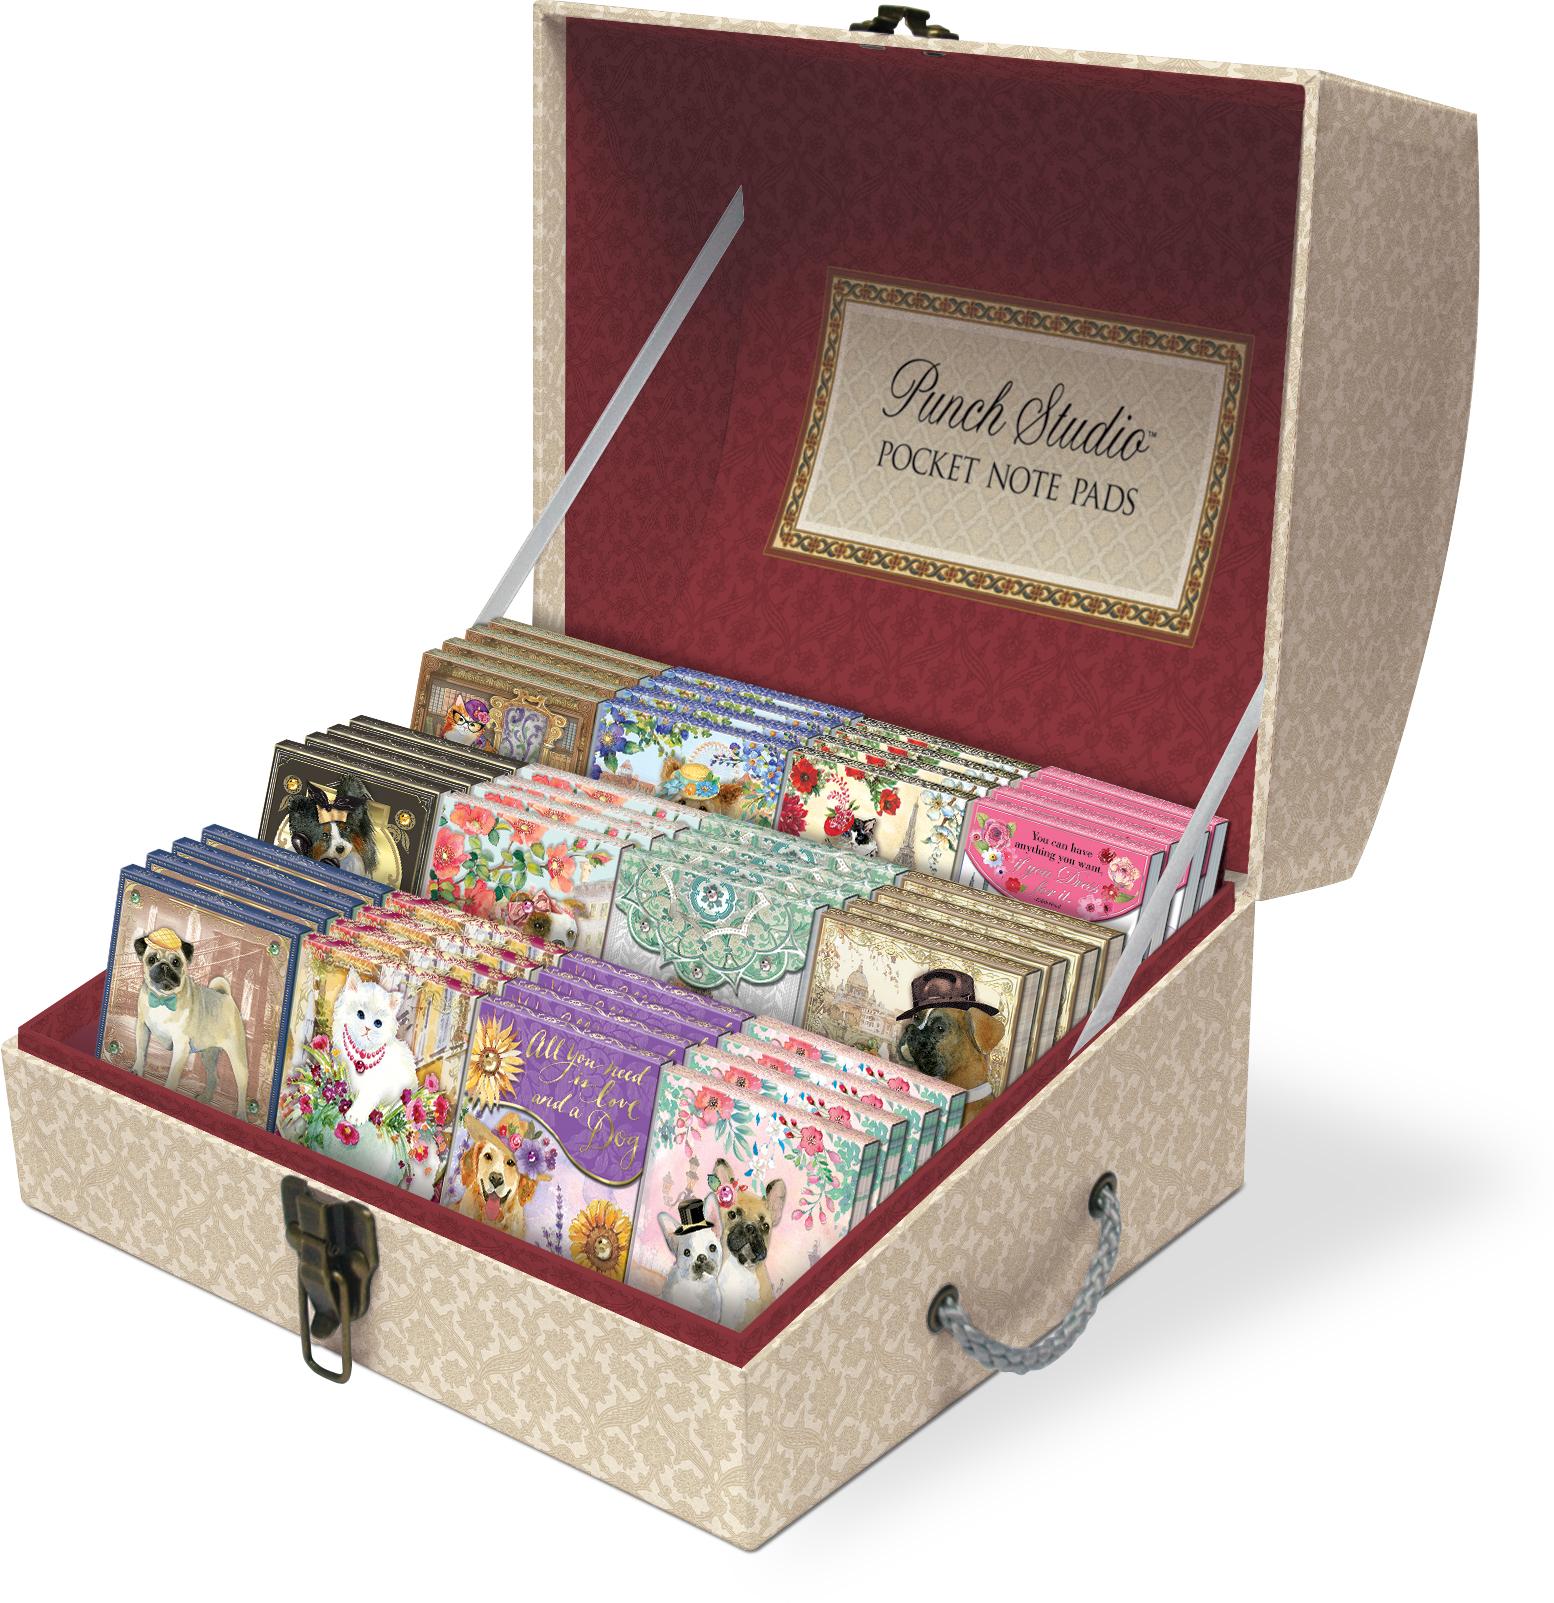 Posh Baby Gifts Uk : Punch studio everyday posh pets pocket note pads choose